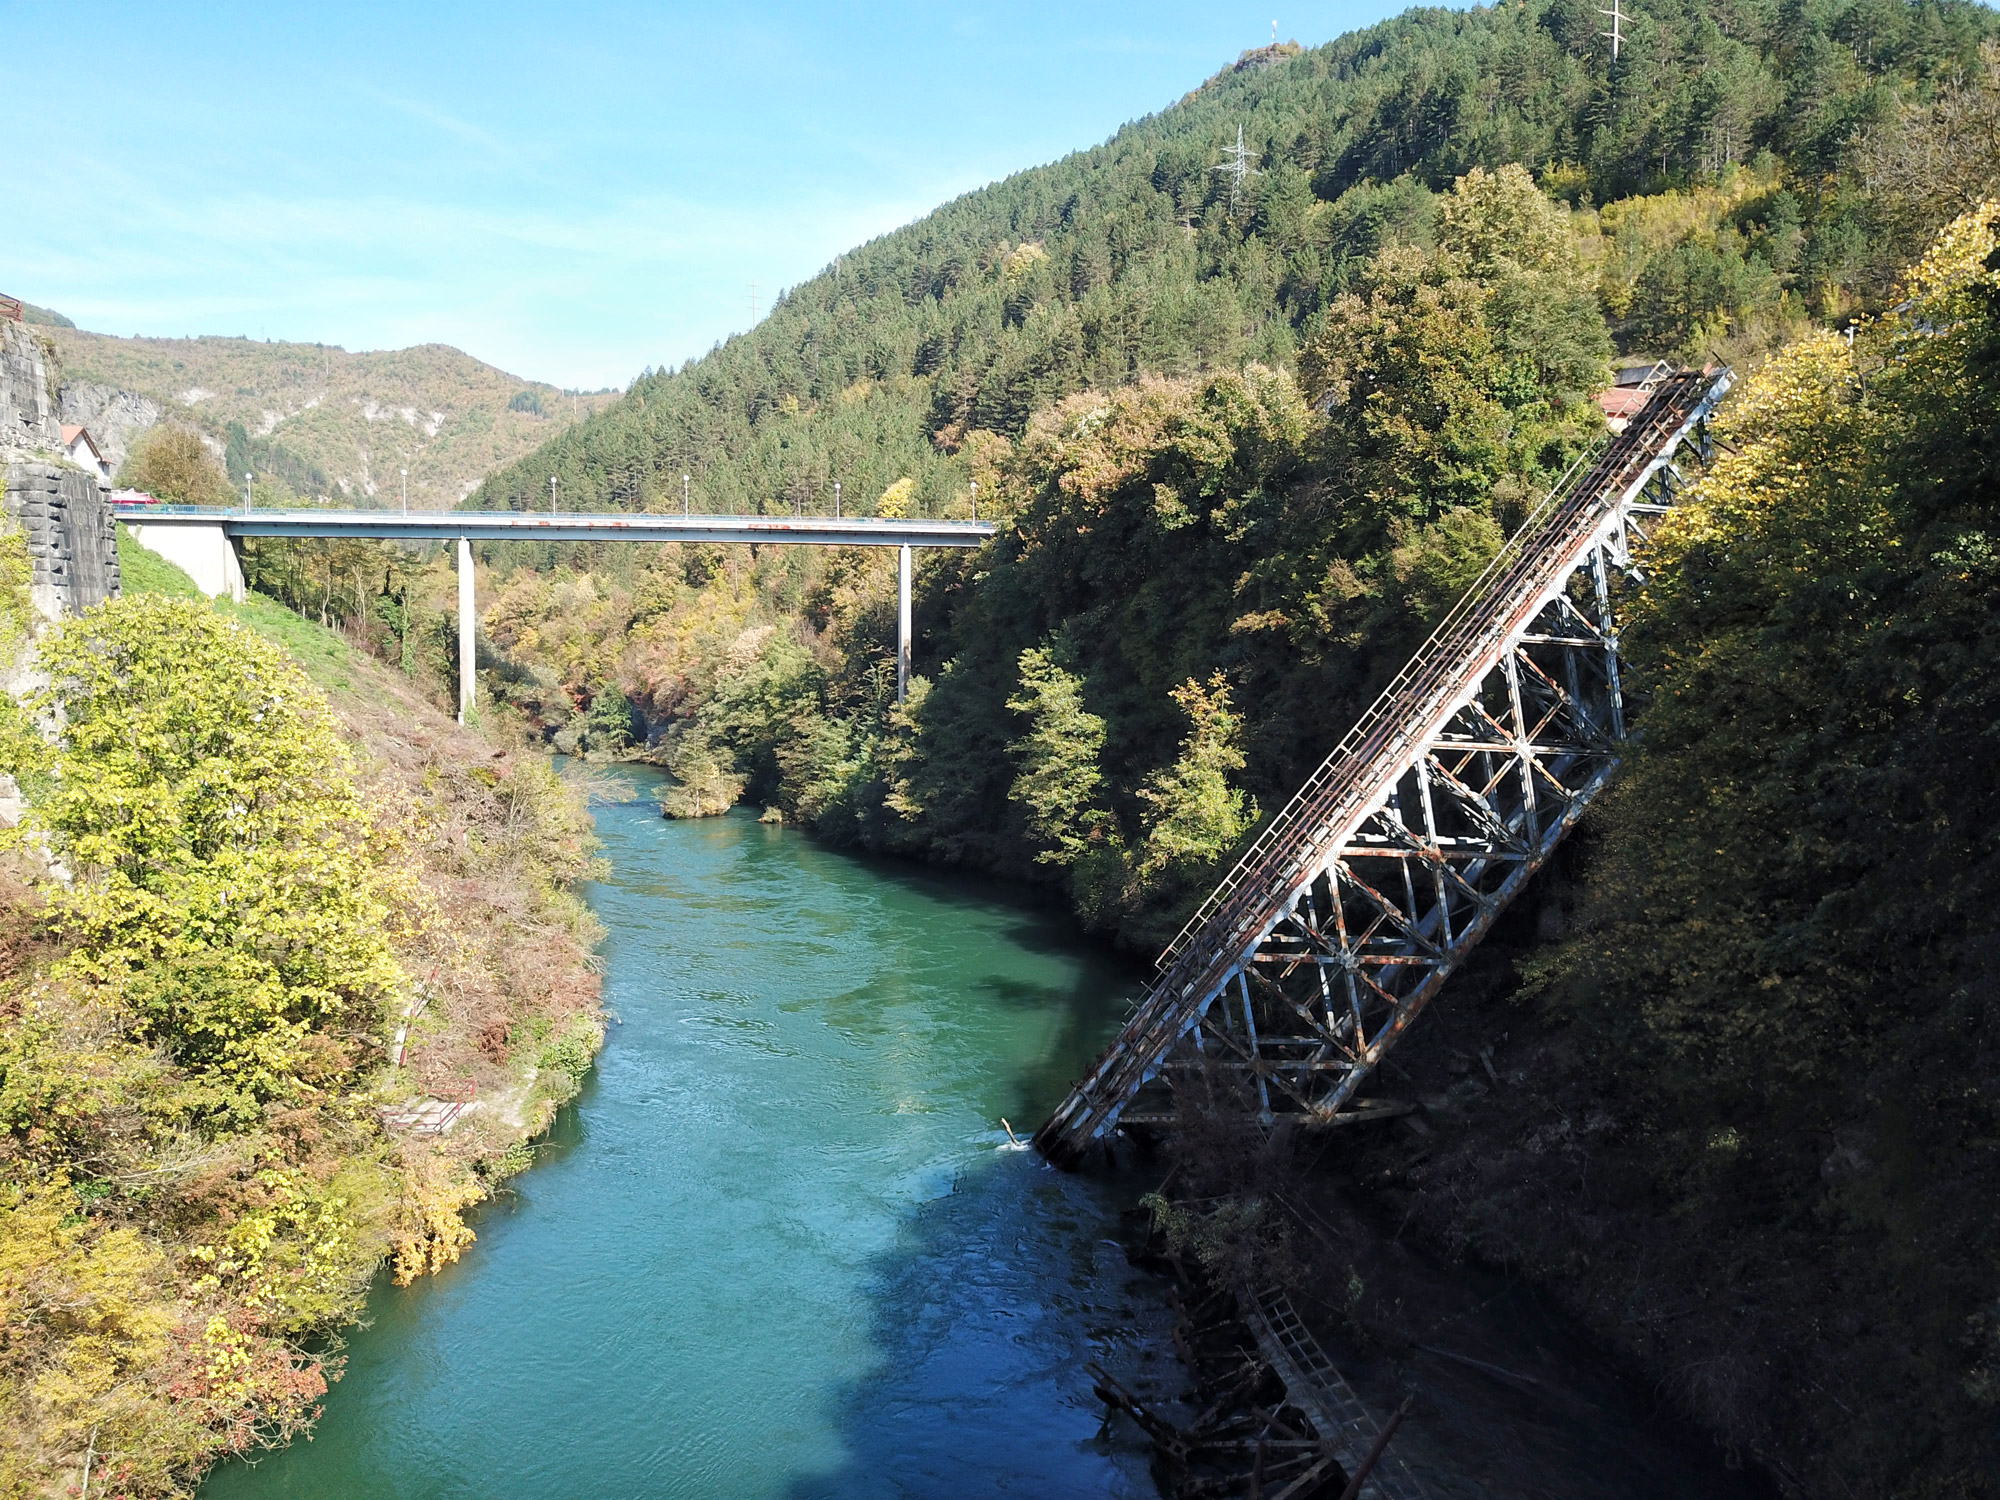 Bosnië & Herzegovina - Neretva River